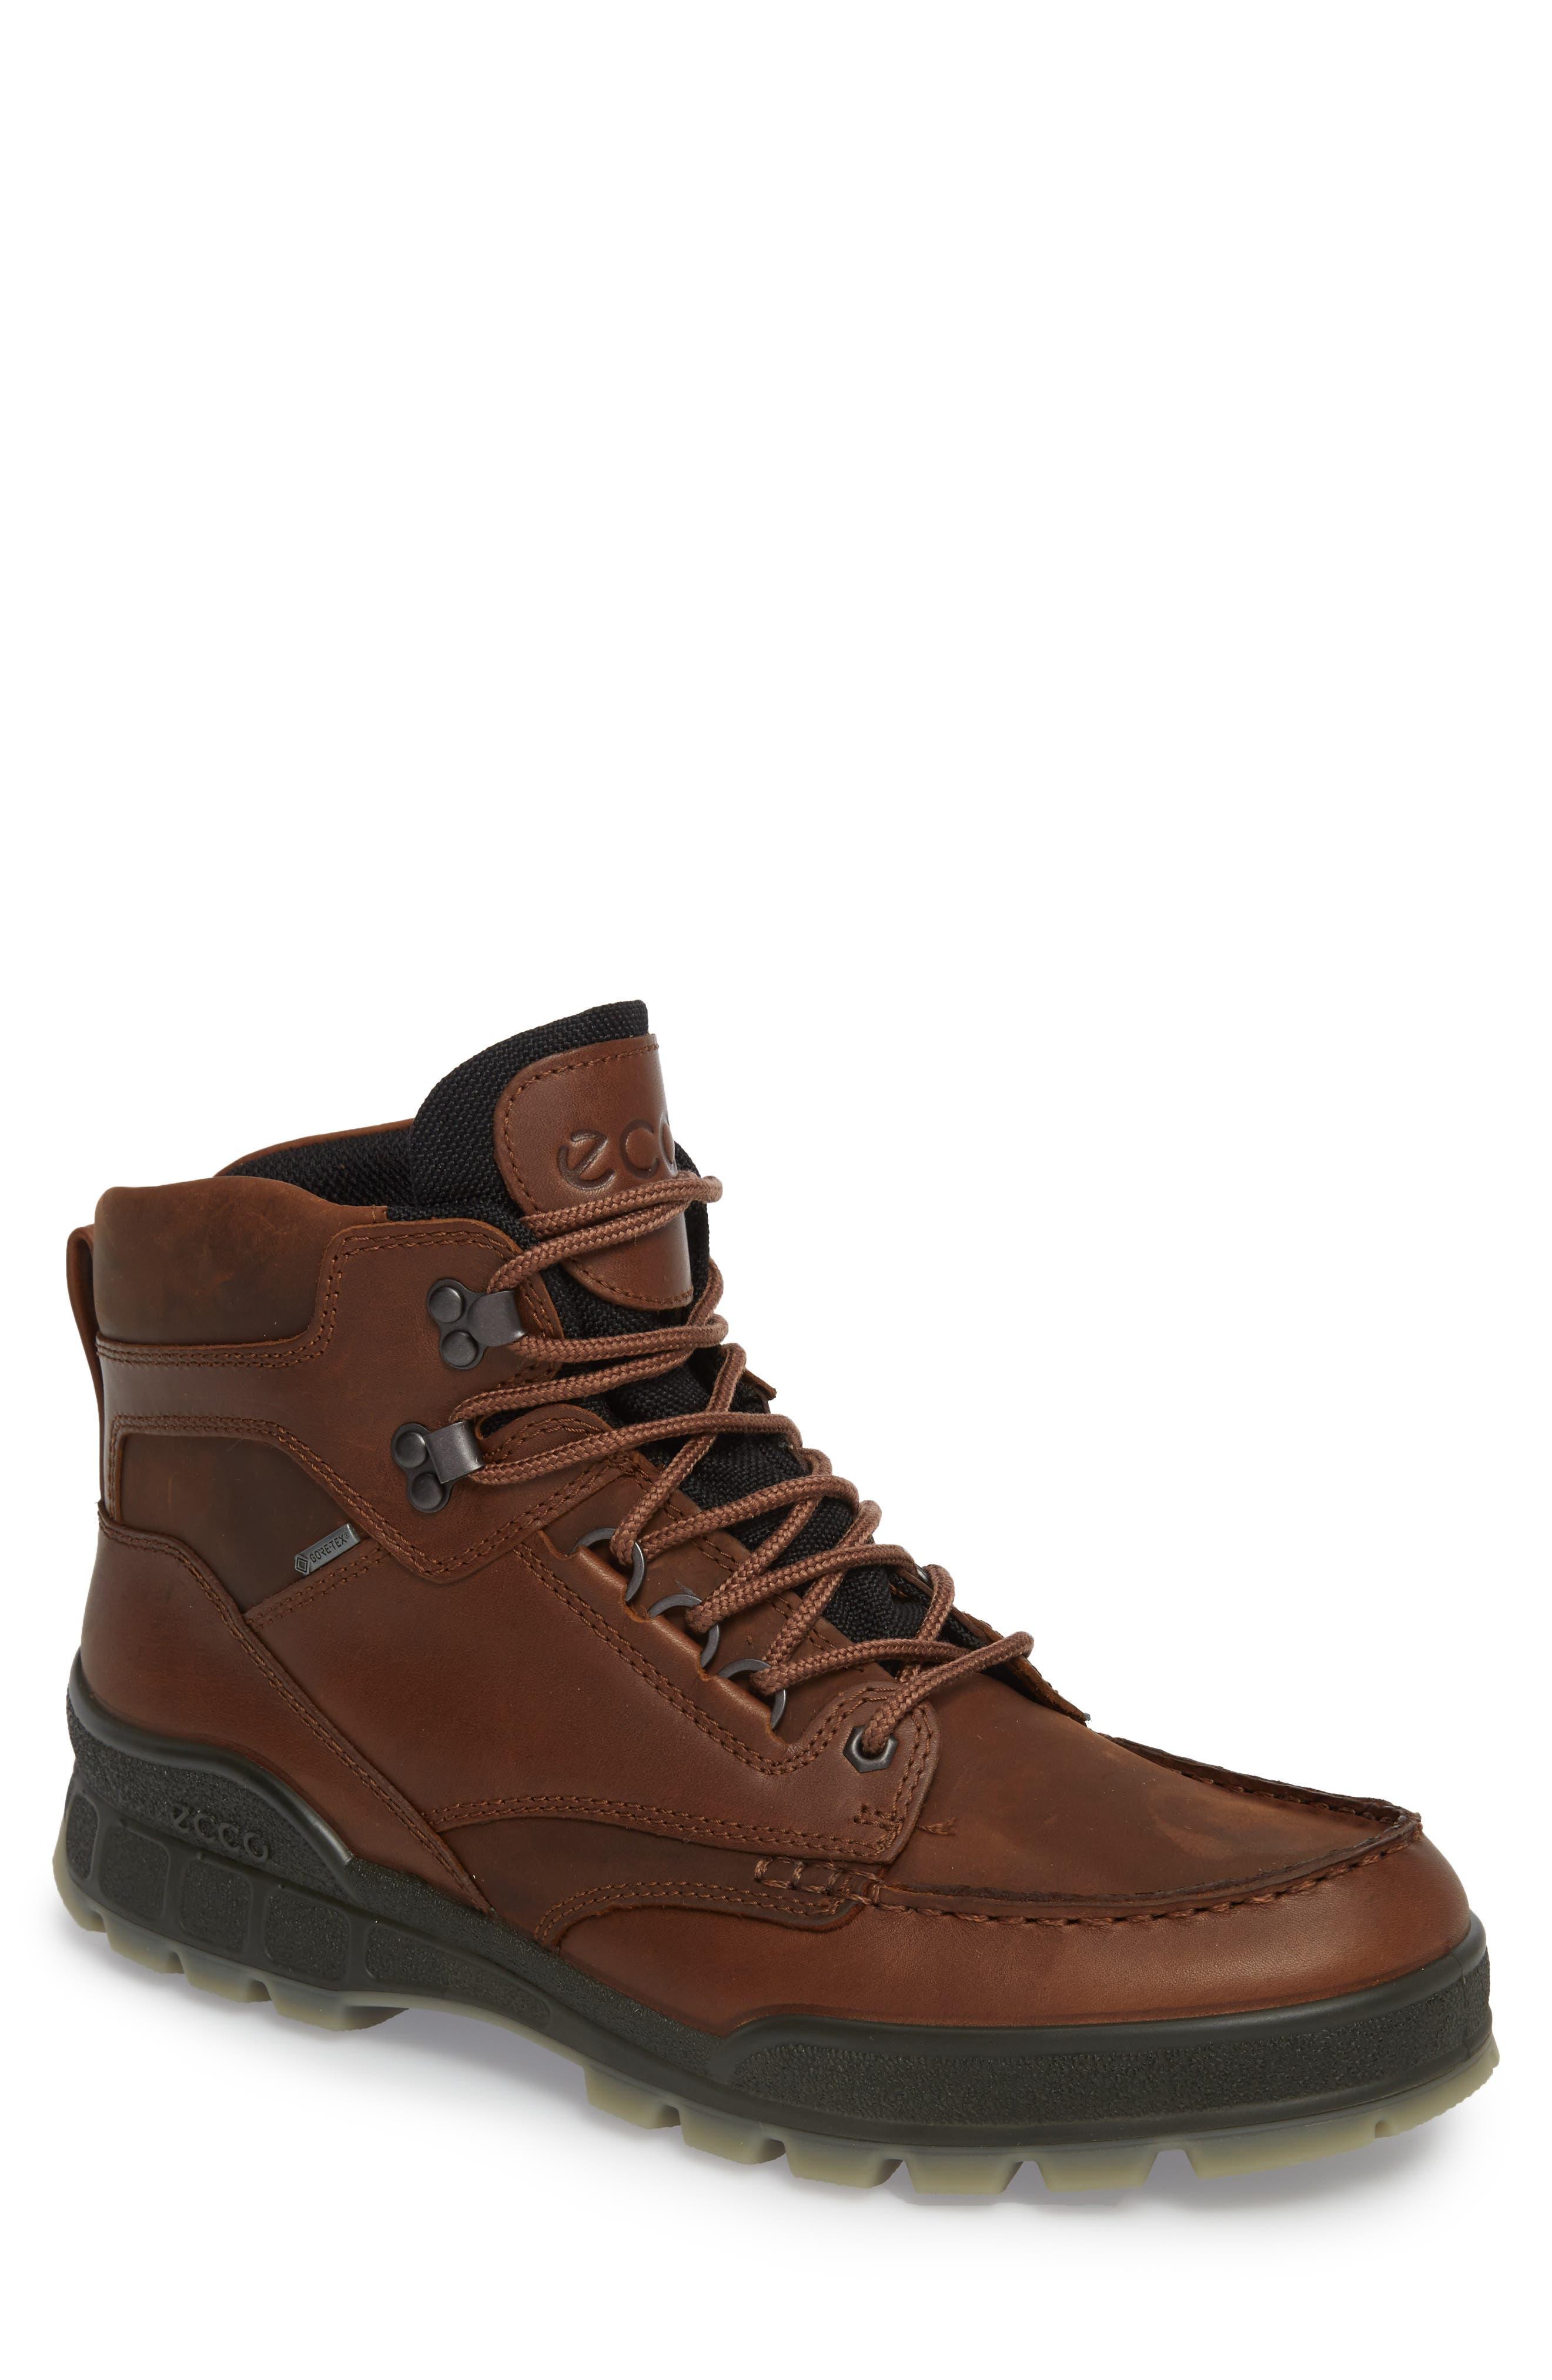 Ecco Track Ii High Waterproof Boot,8.5 - Metallic